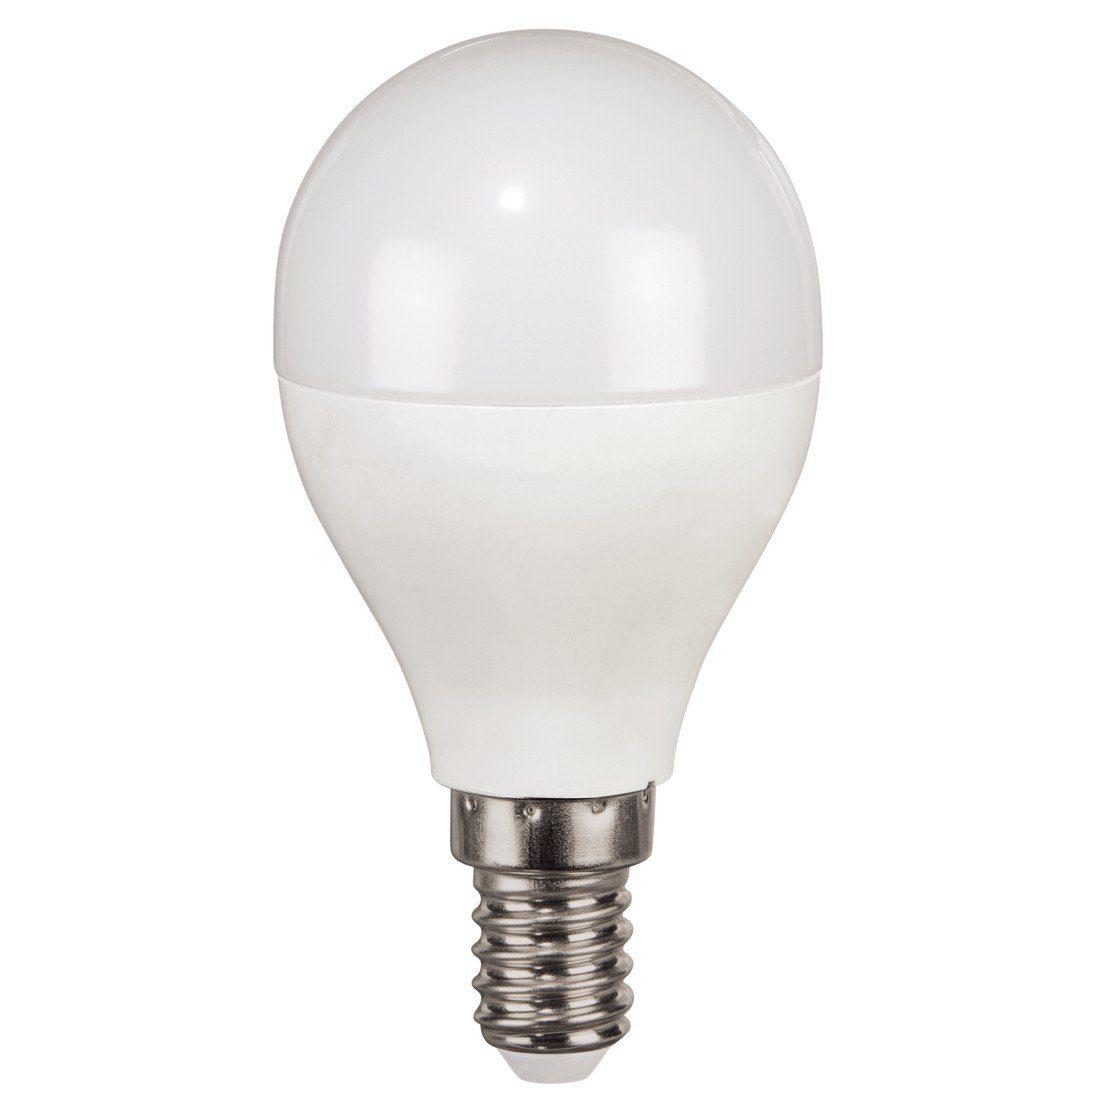 Xavax LED-Lampe, E14, 520lm ersetzt 42W Tropfenlampe, Tageslicht